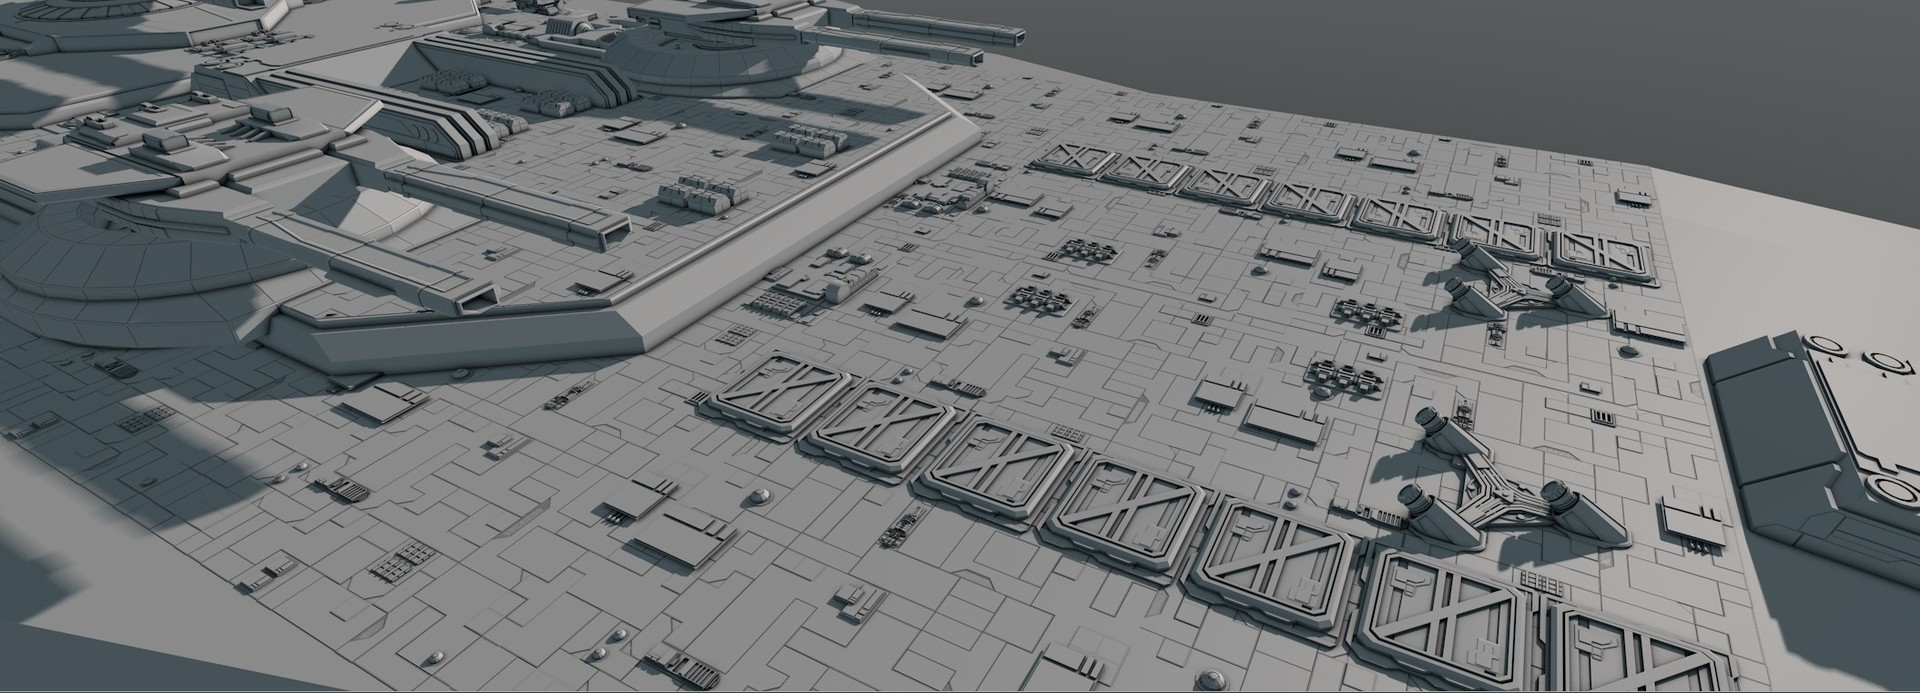 Glenn clovis concept battleship saratoga 14a